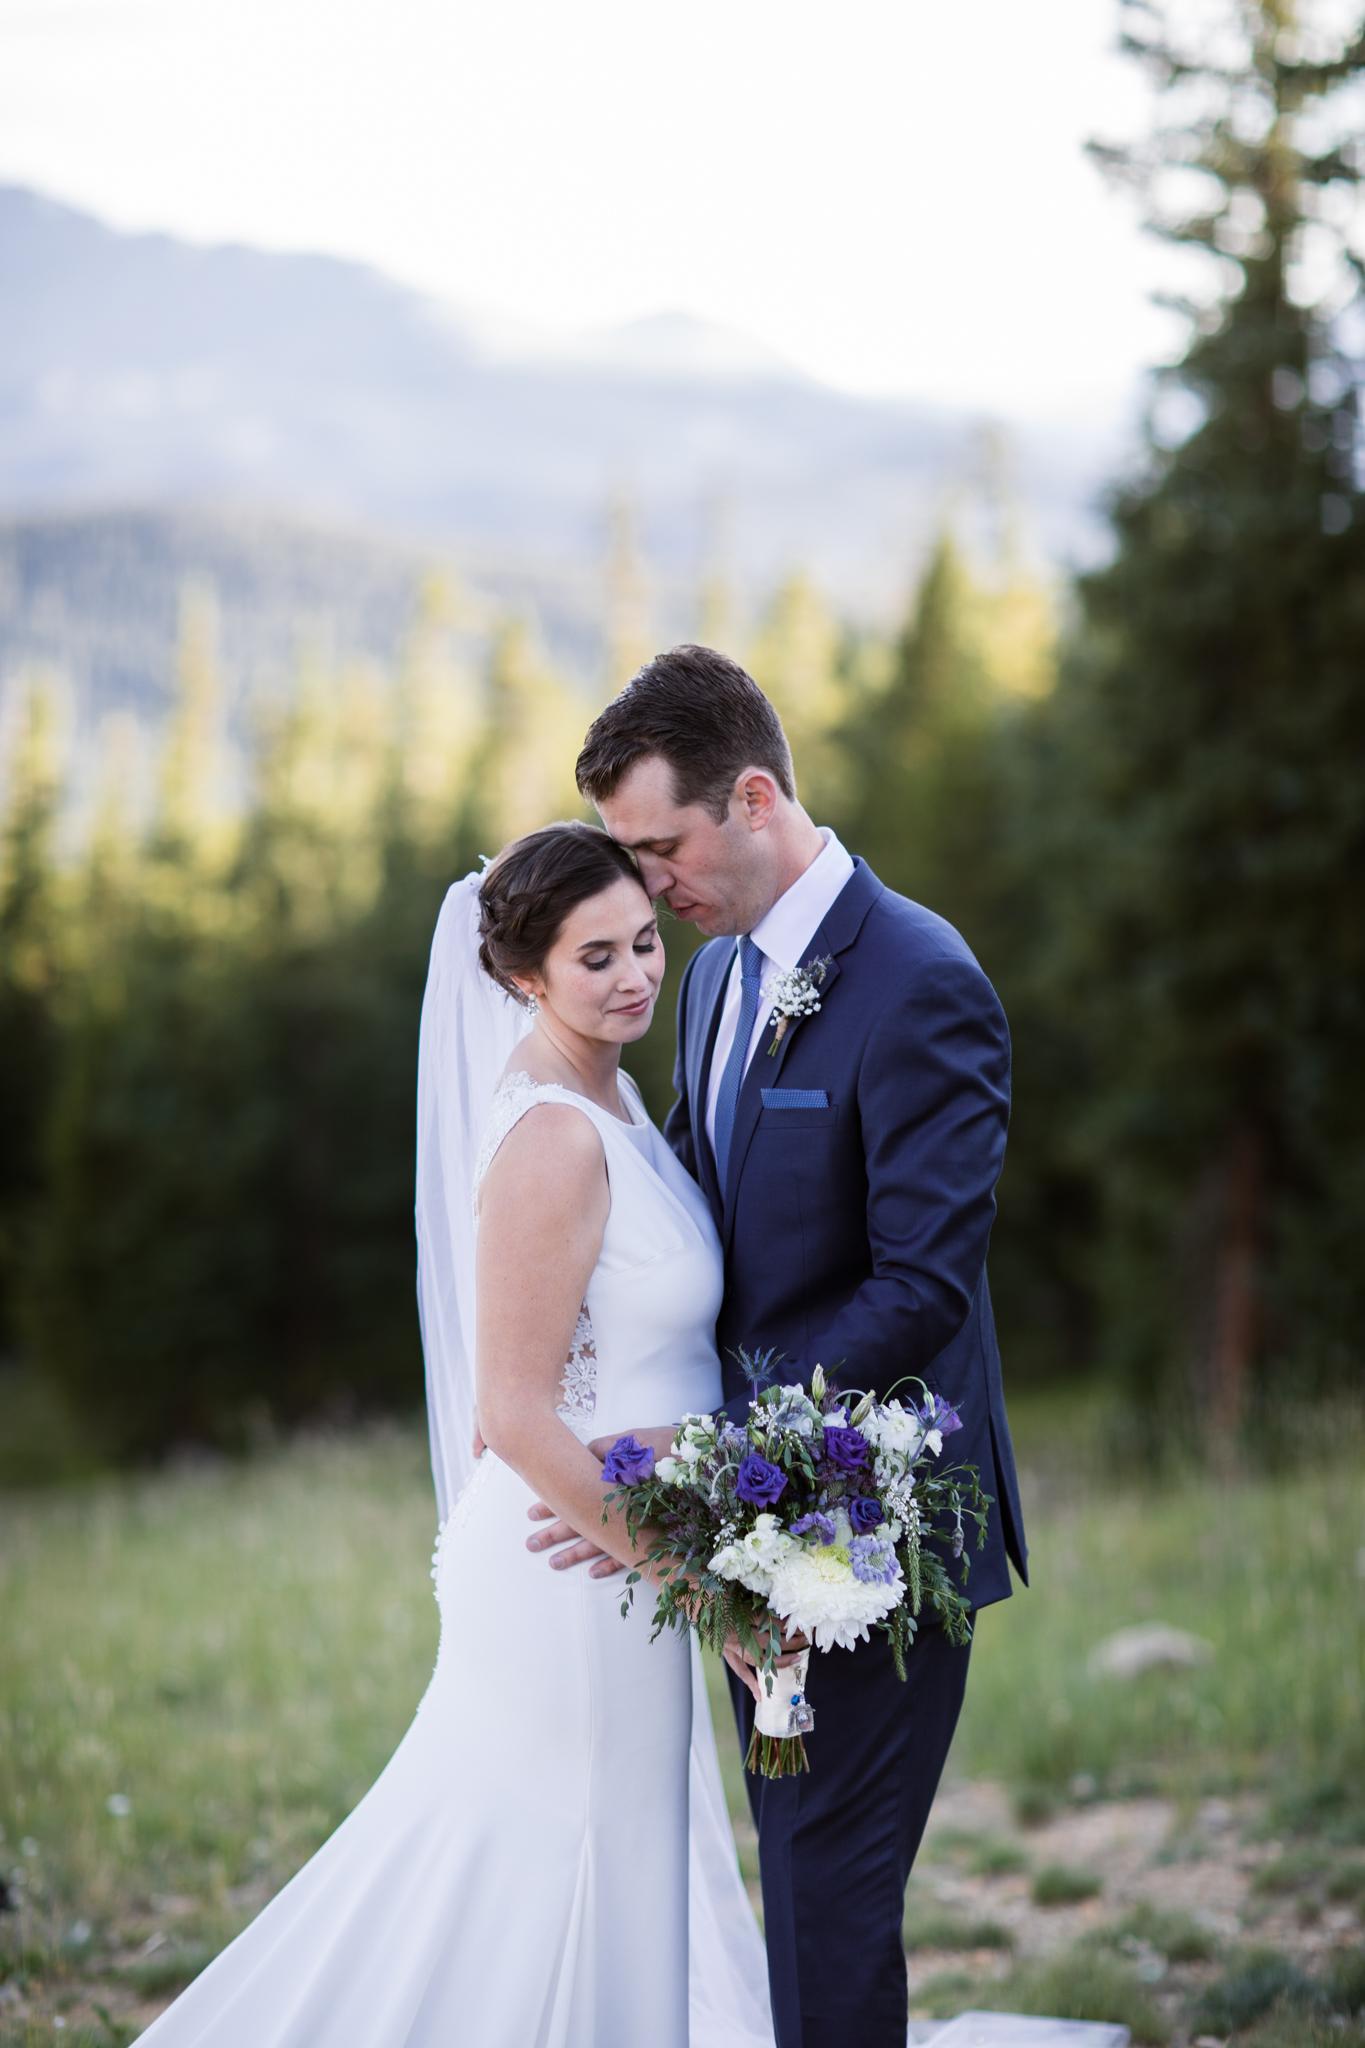 Marissa and Ryan Timber Ridge Lodge, Keystone